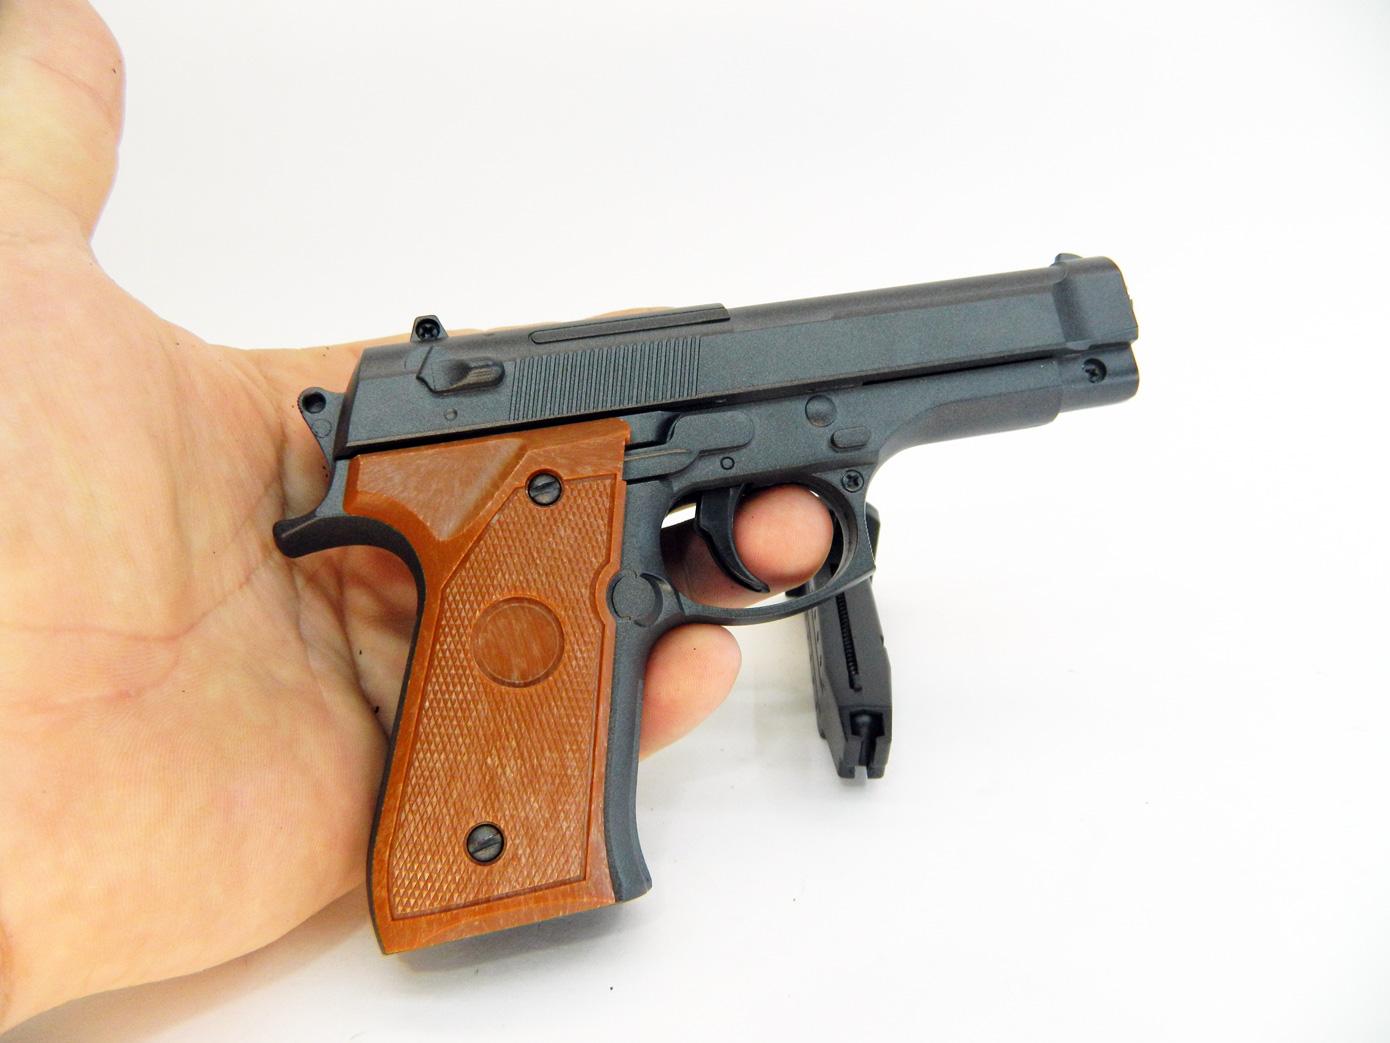 Beretta 92 mini масштаб 1:1 изображение 4